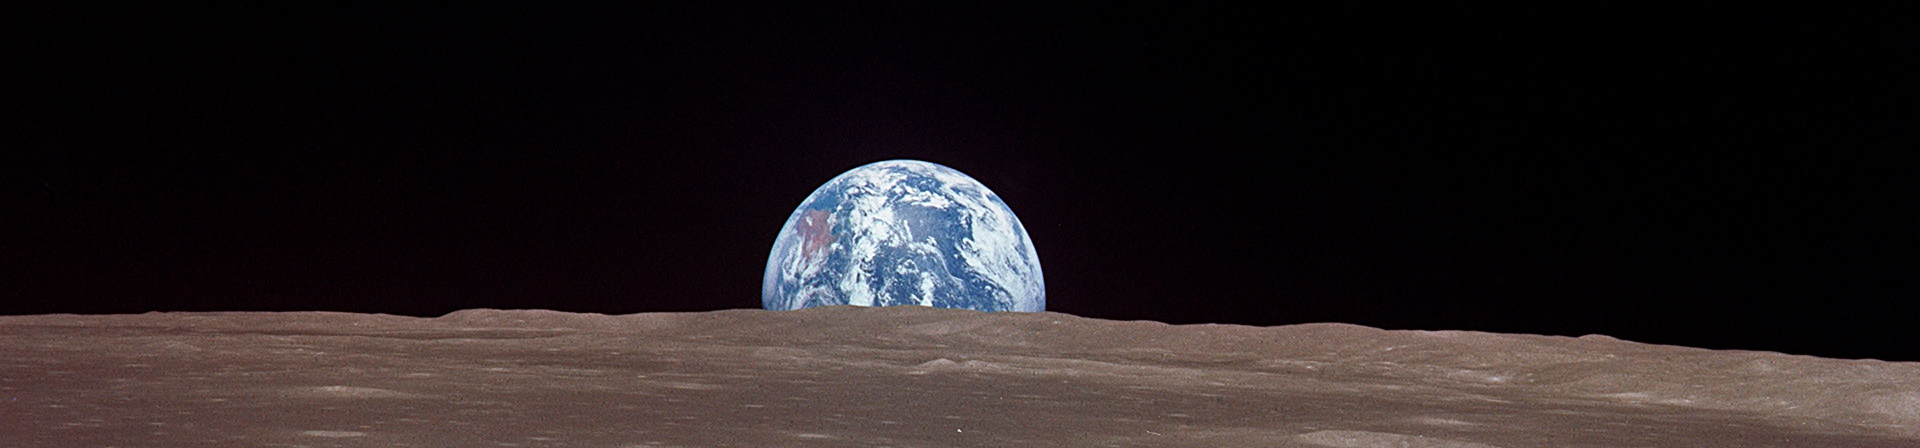 File:Earthrise cutout.jpg - Wikimedia Commons